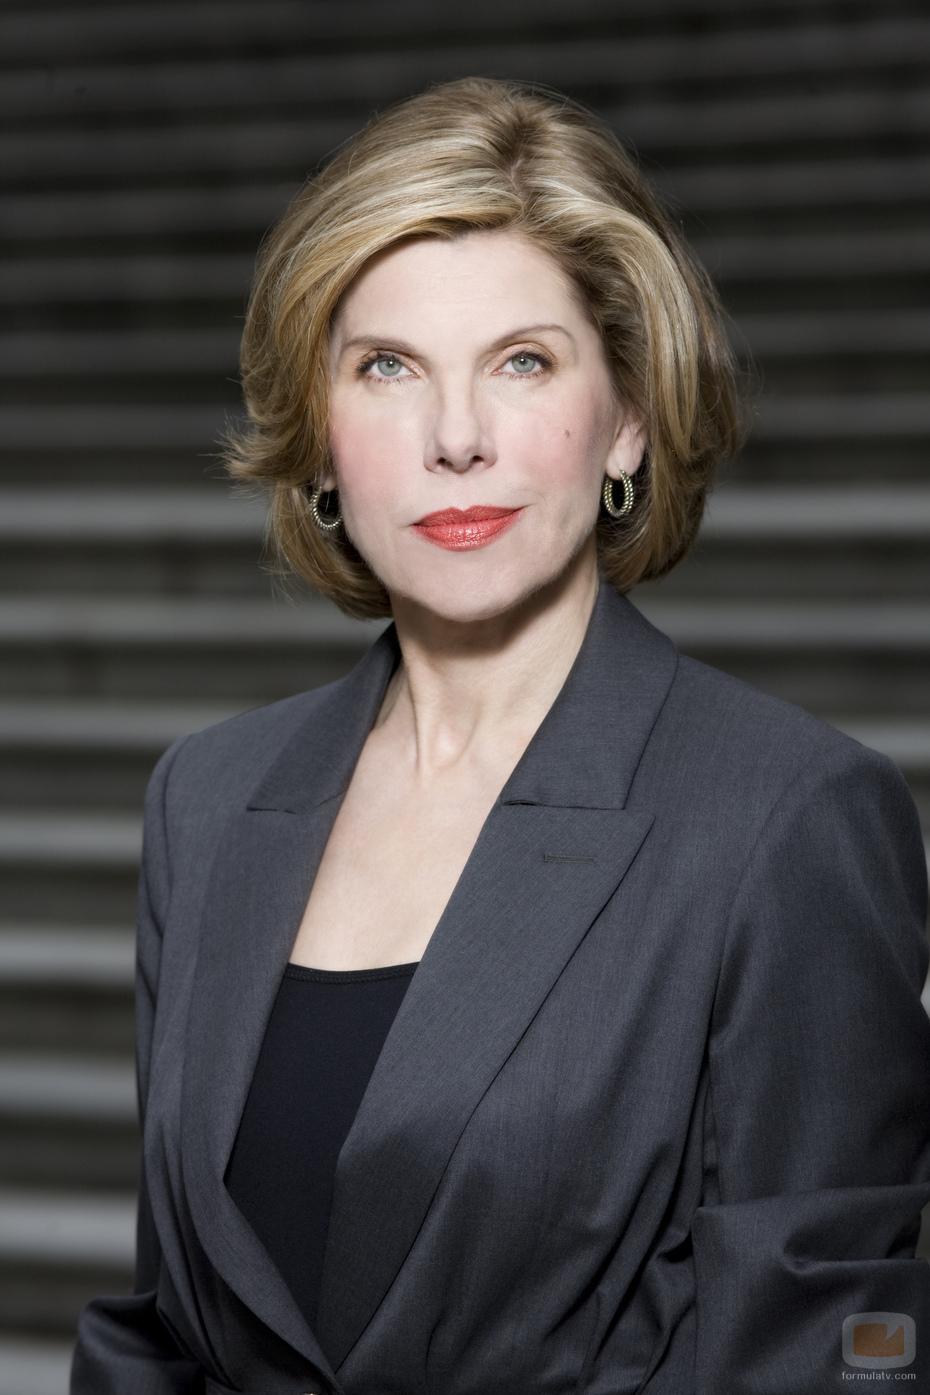 foto de Actress and Celebrity Pictures: Christine Baranski